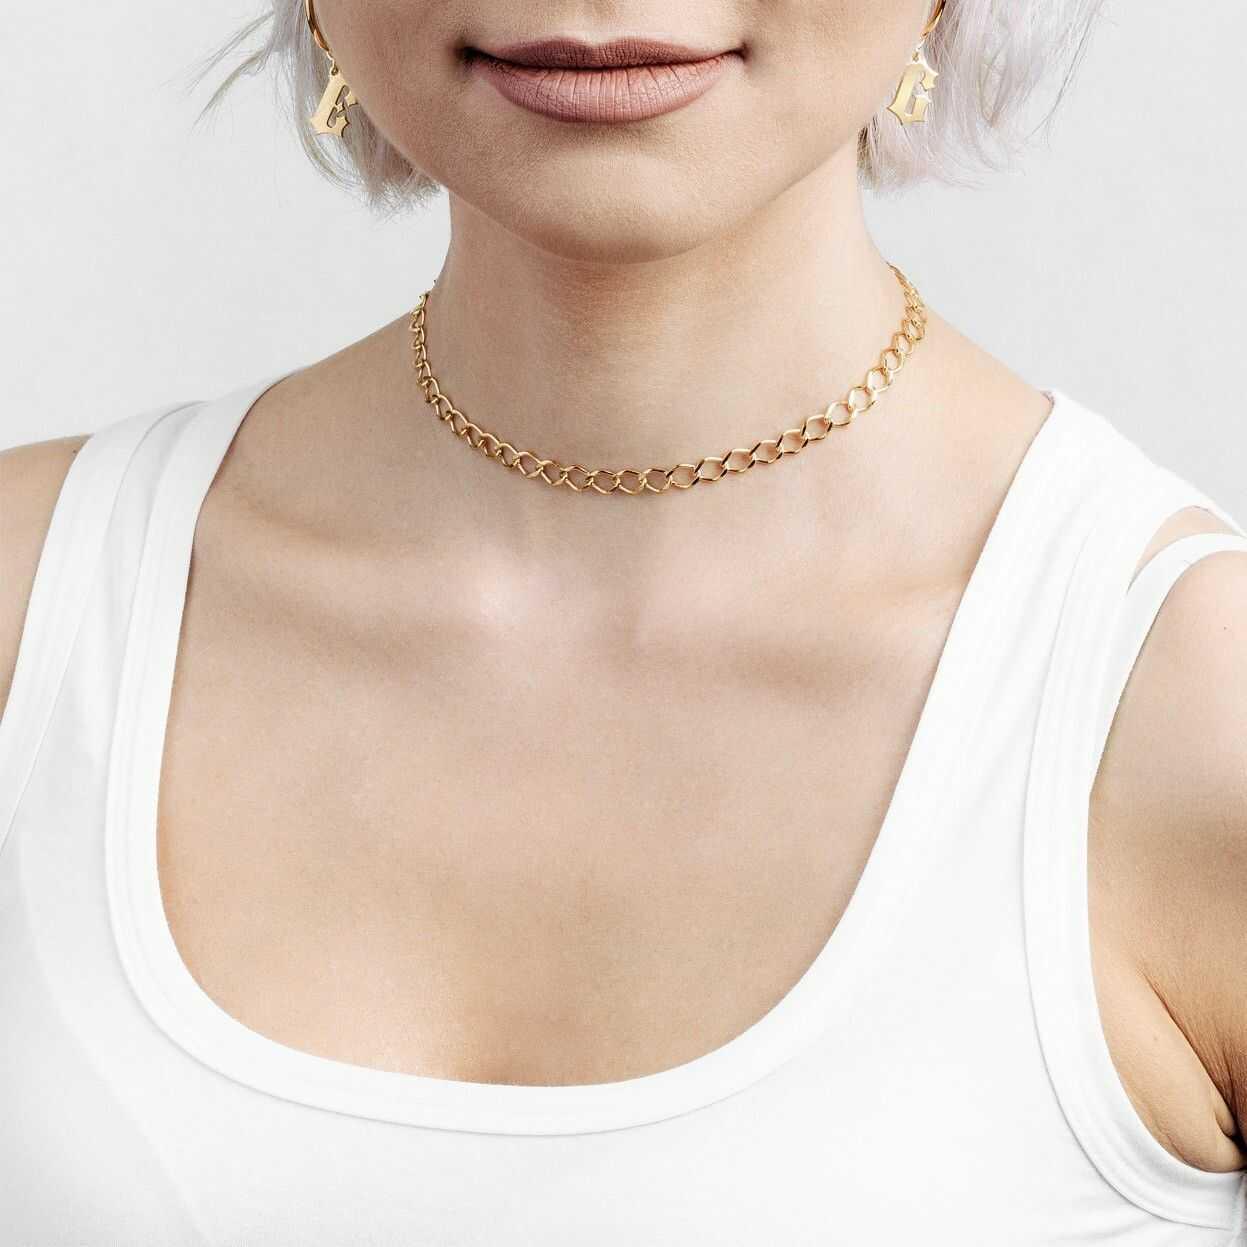 Srebrny łańcuszek choker rombo, srebro 925 : Długość (cm) - 35 + 5, Srebro - kolor pokrycia - Pokrycie żółtym 18K złotem